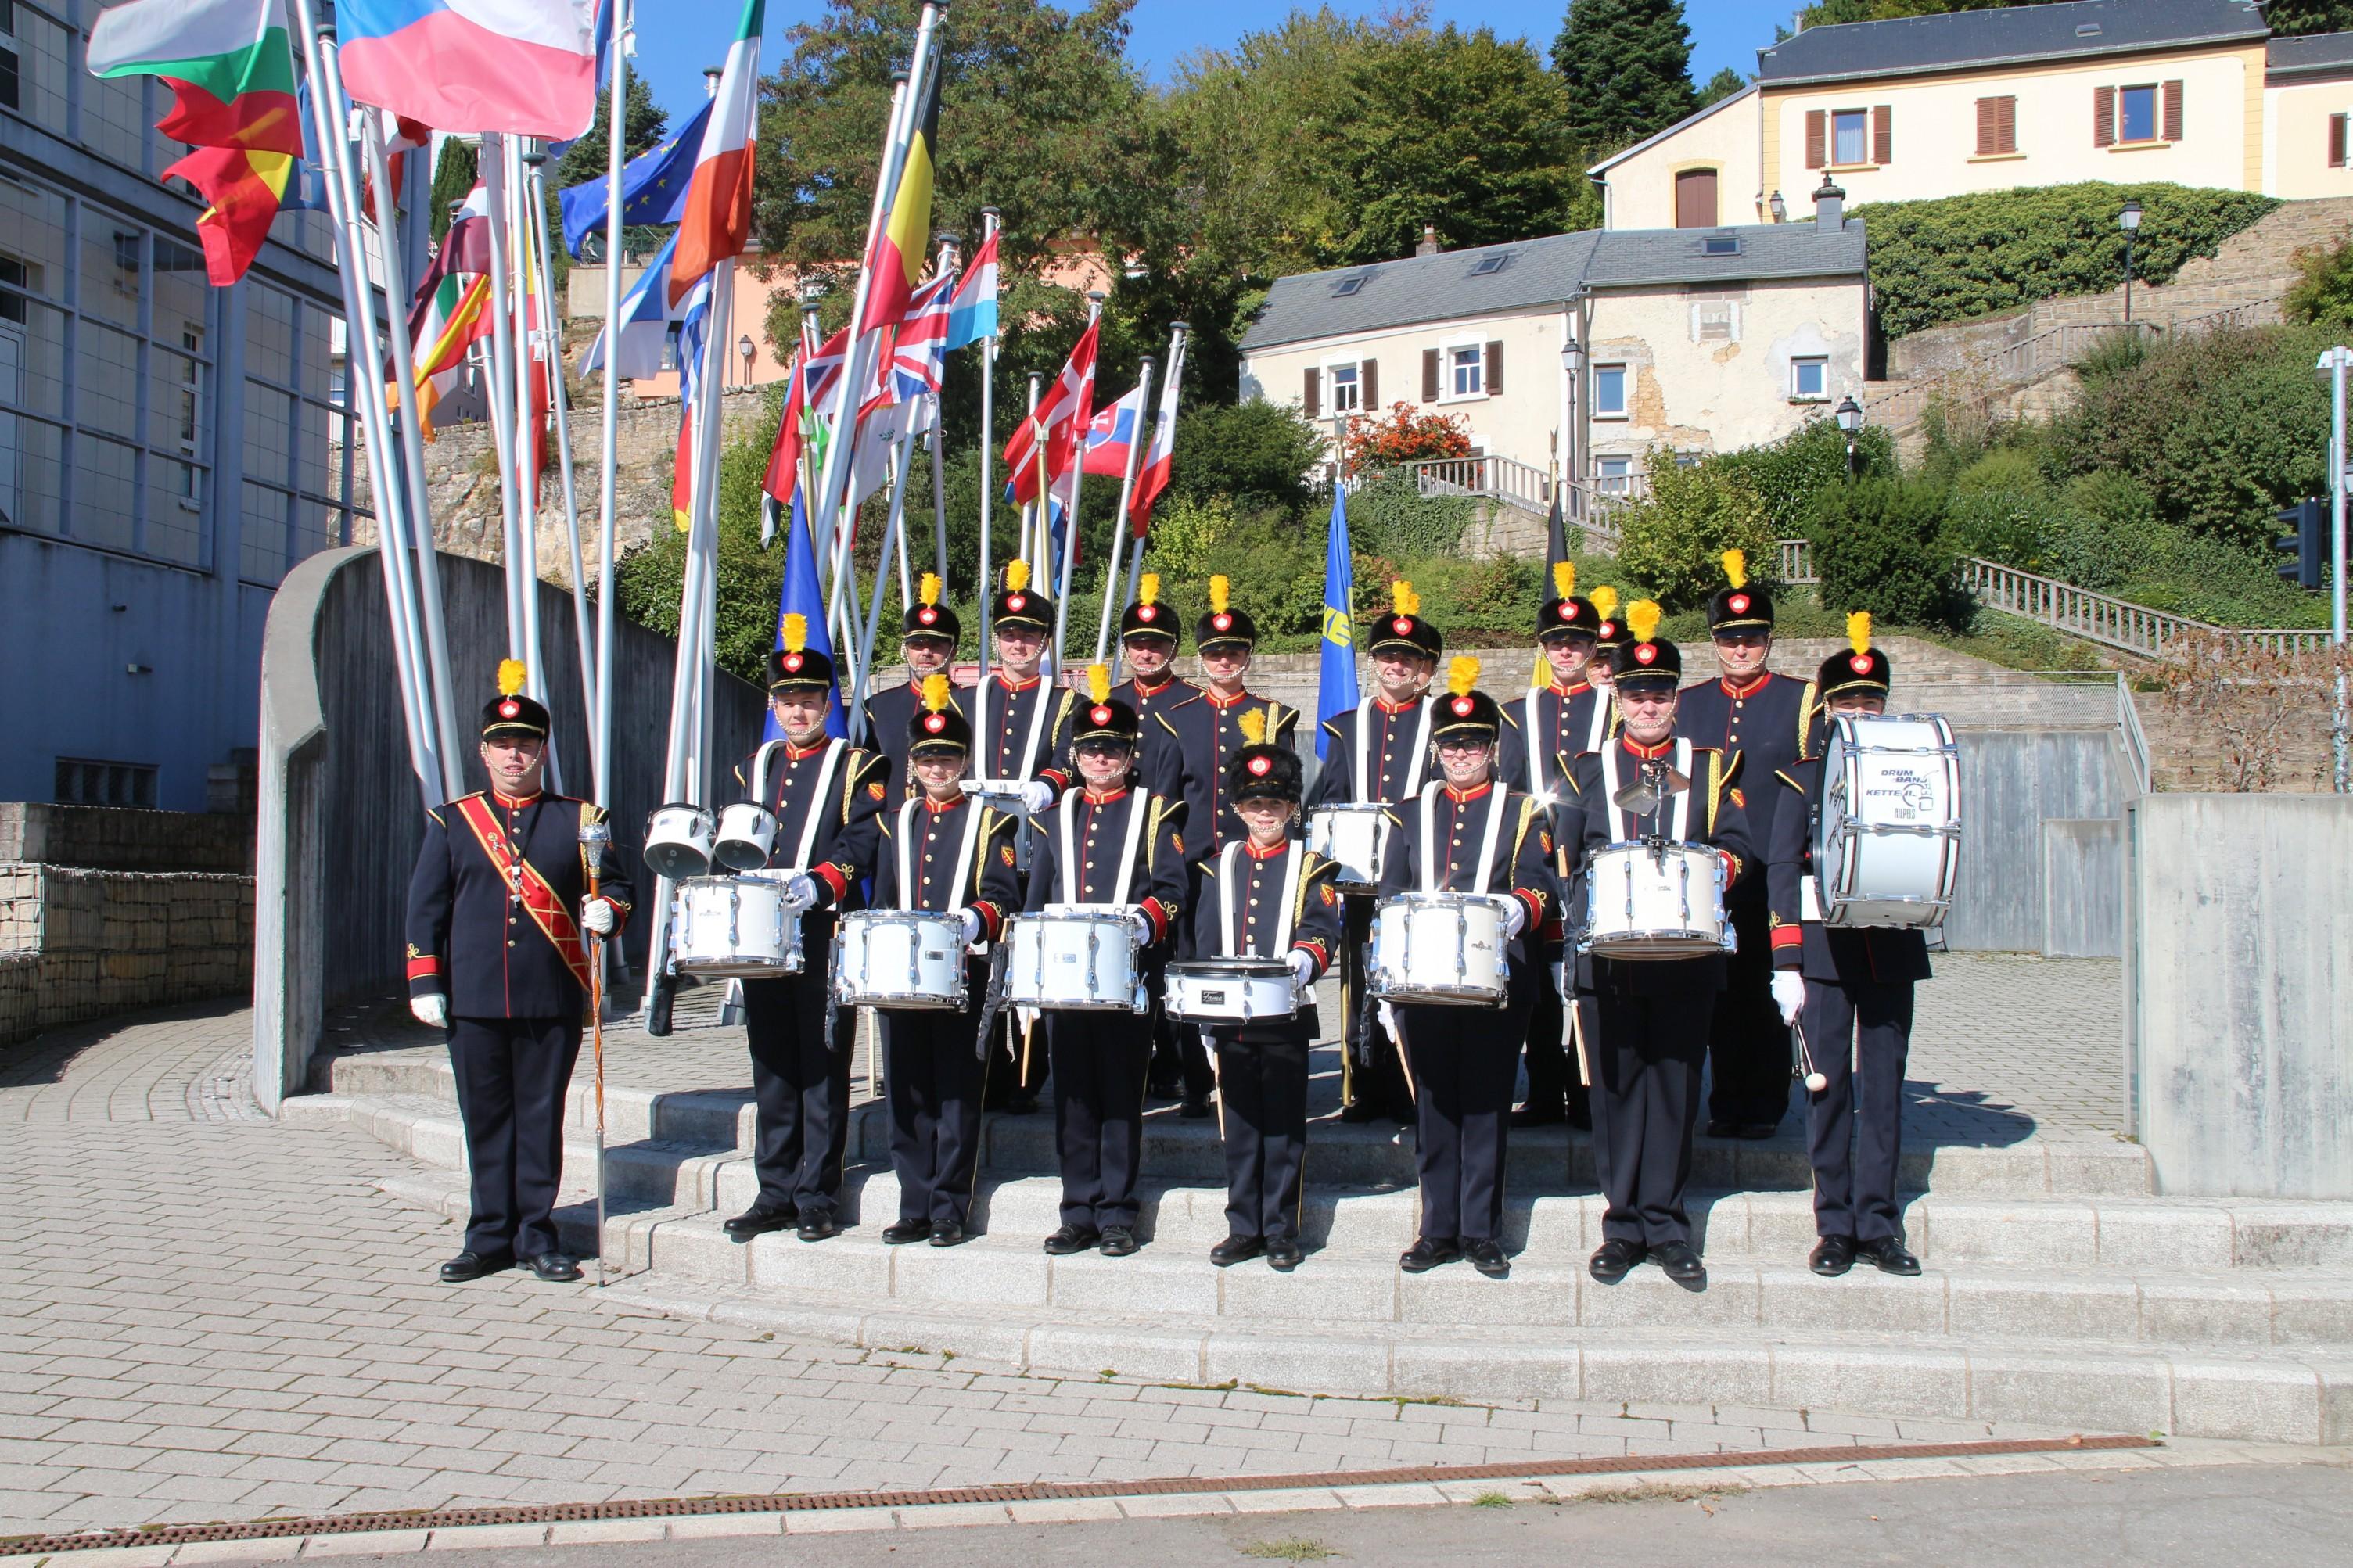 Drumband Kettenis